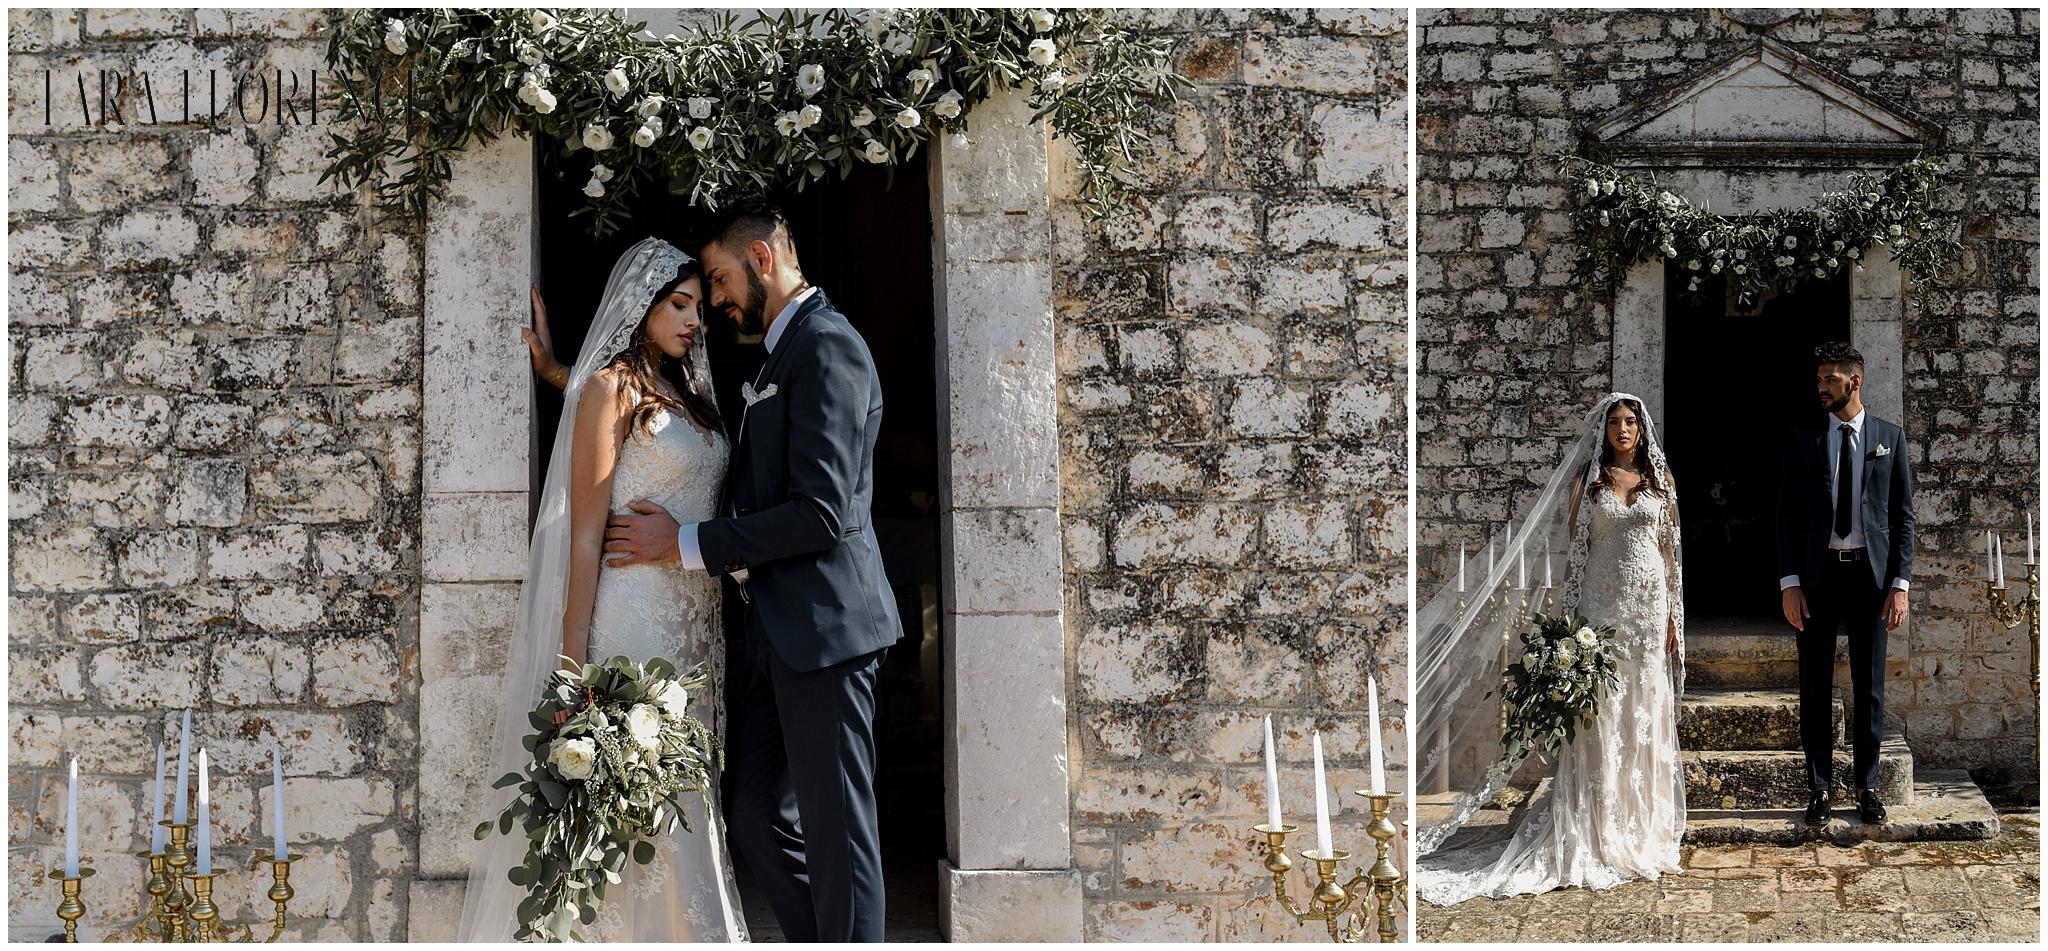 Puglia-Tara-Florence-Bridal-Editorial-142_WEB.jpg